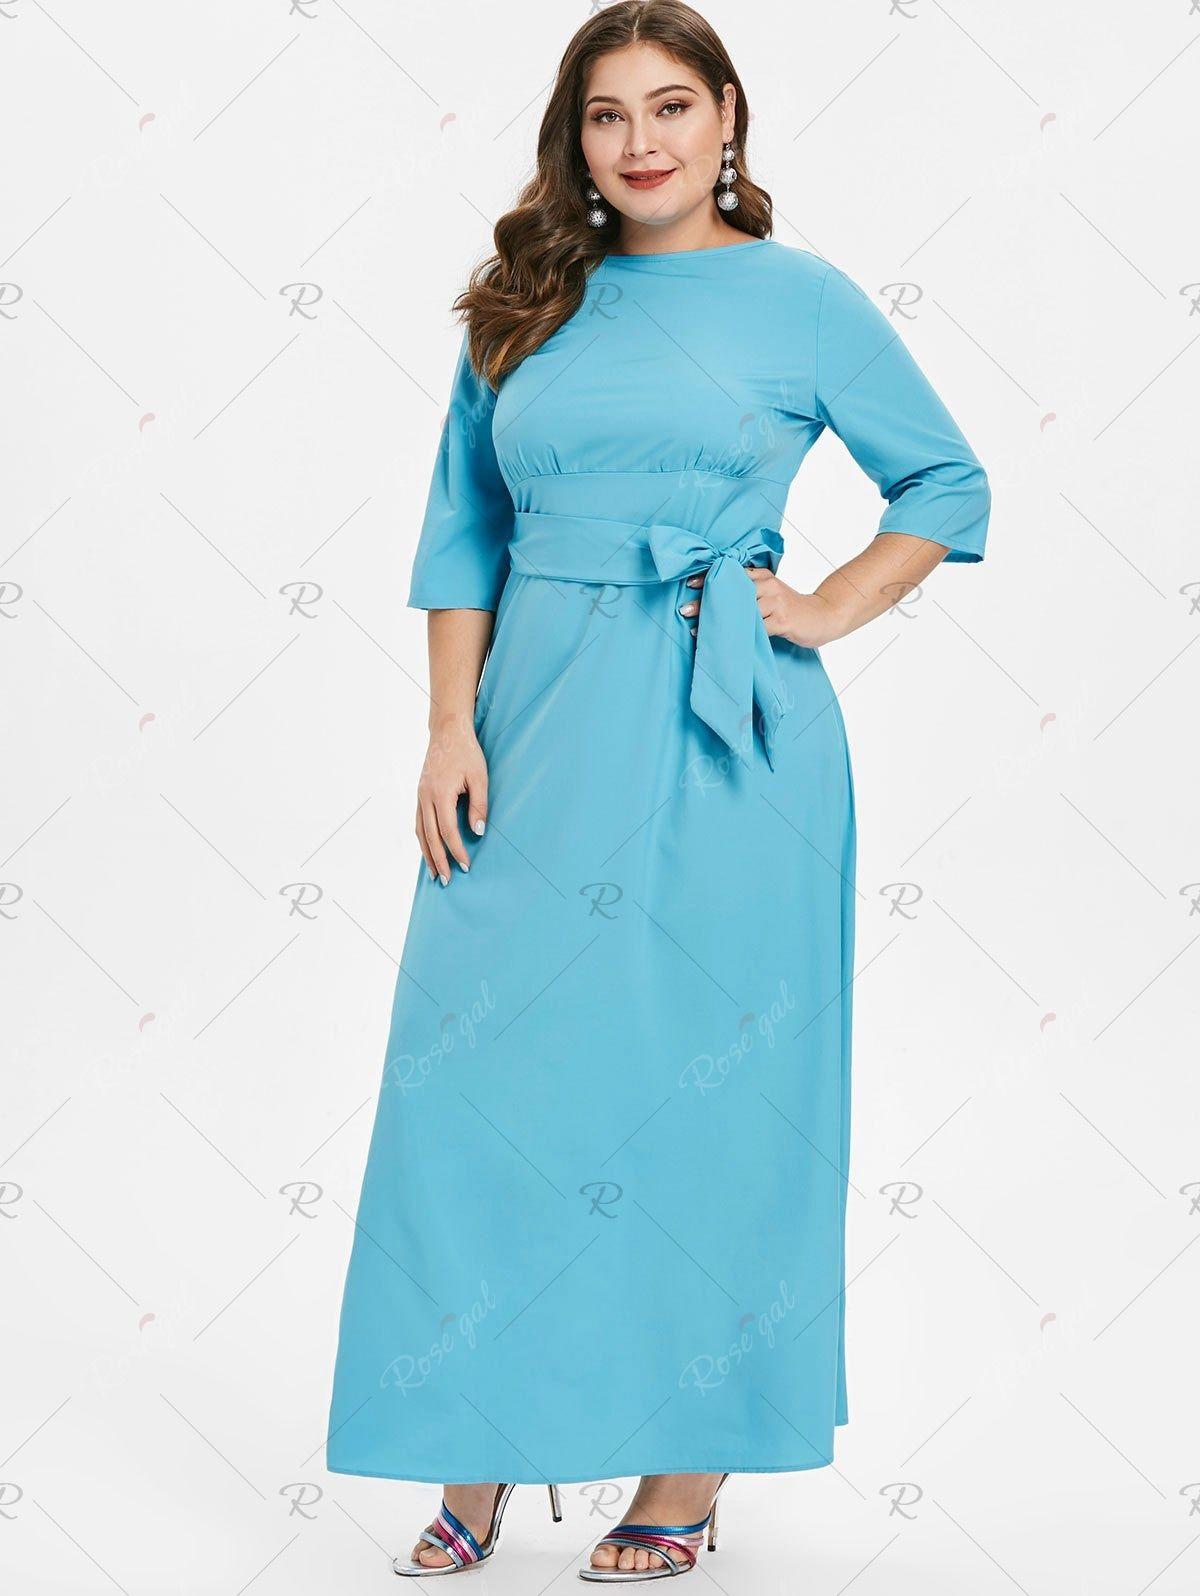 Belted V Neck Plus Size Maxi Dress Plus Size Maxi Dresses Plus Size Maxi Maxi Dress [ 1596 x 1200 Pixel ]